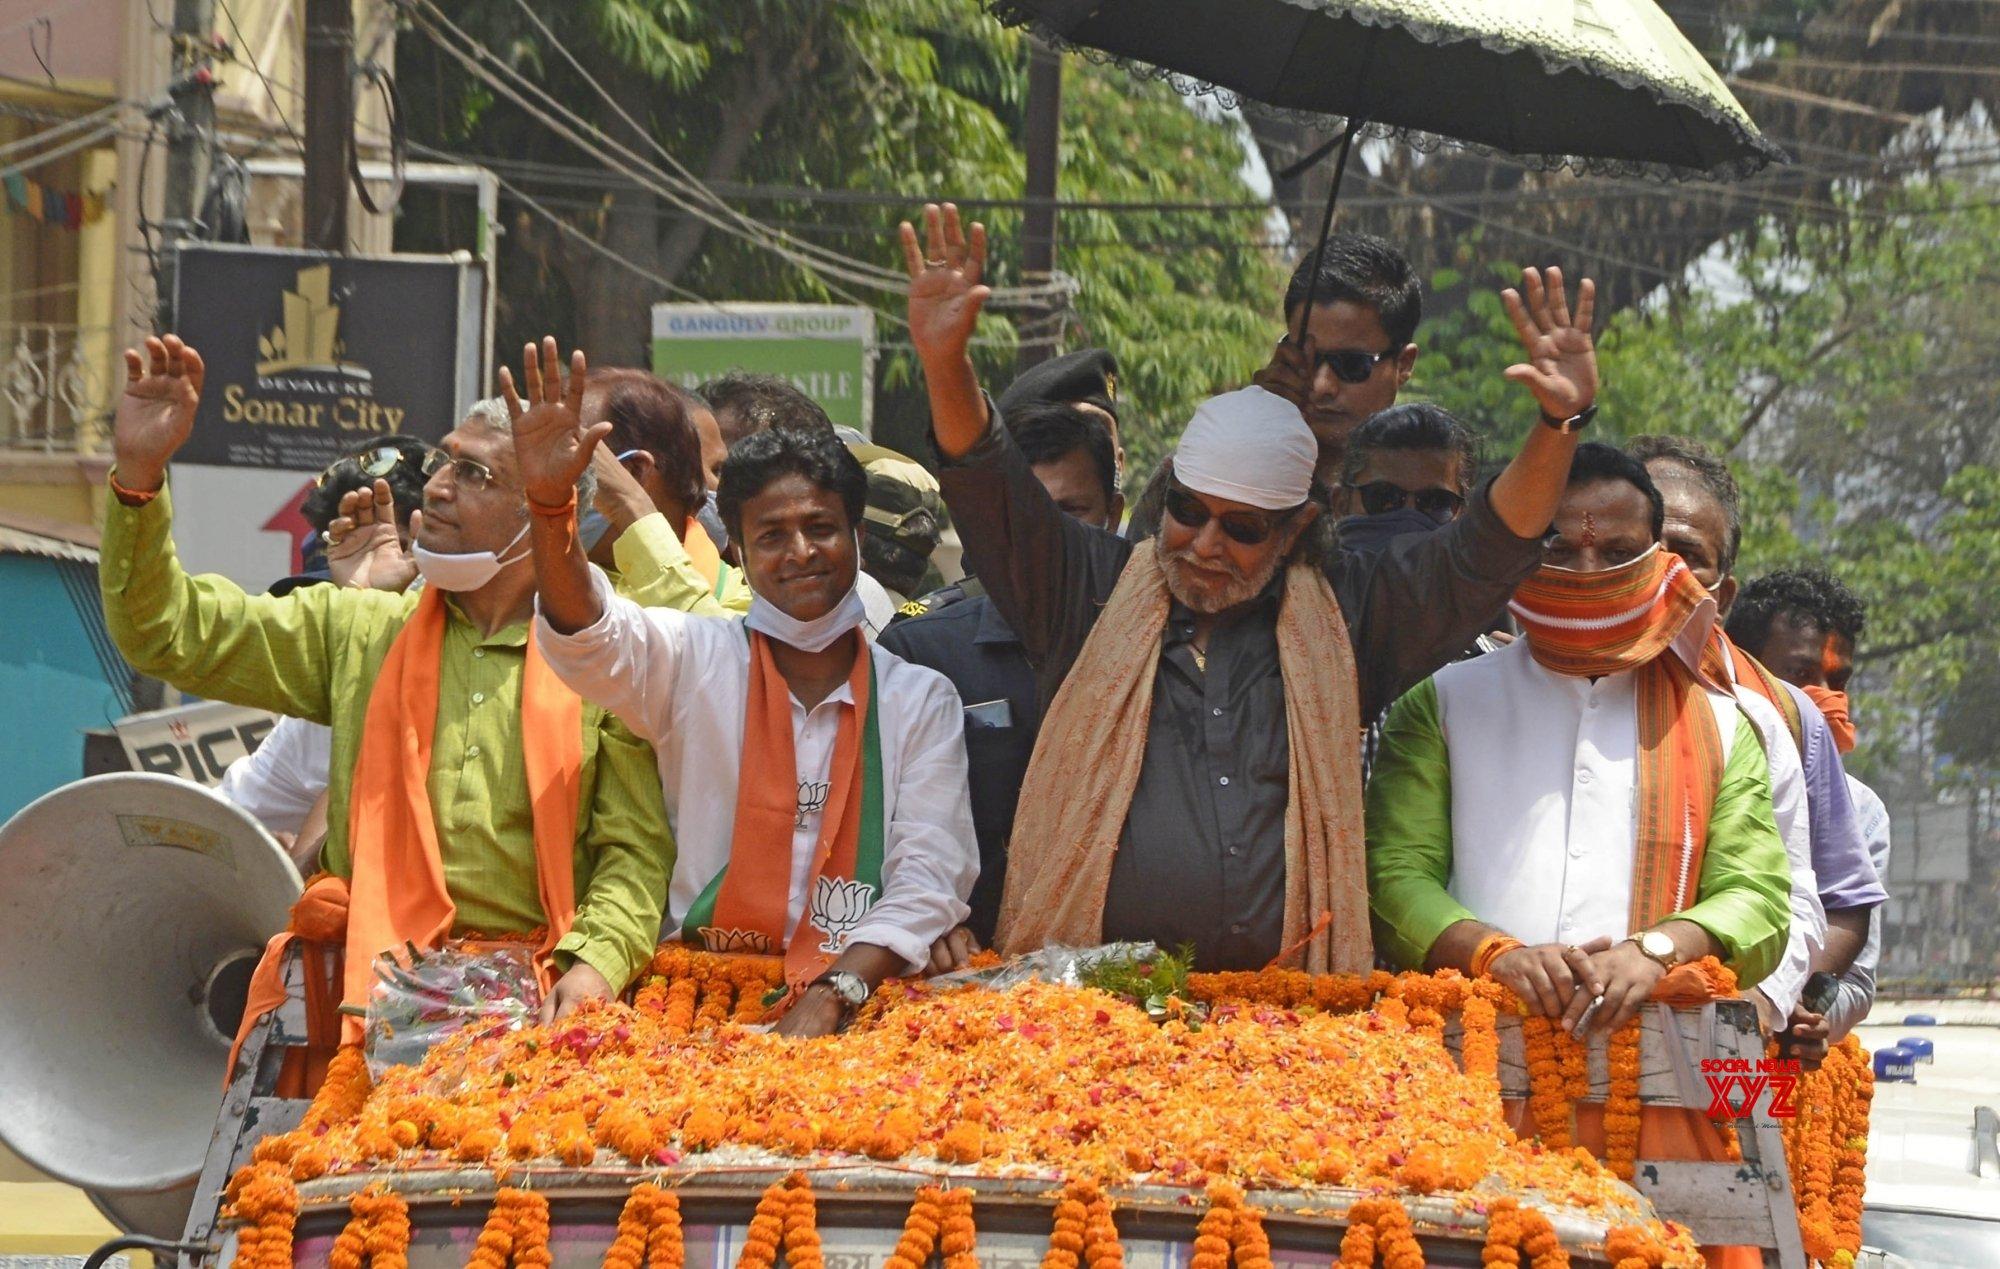 Kolkata: Actor turned BJP leader Mithun Chakraborty at a roadshow at Gariya ahead of the 4th phase of the State Assembly election in Kolkata. #Gallery